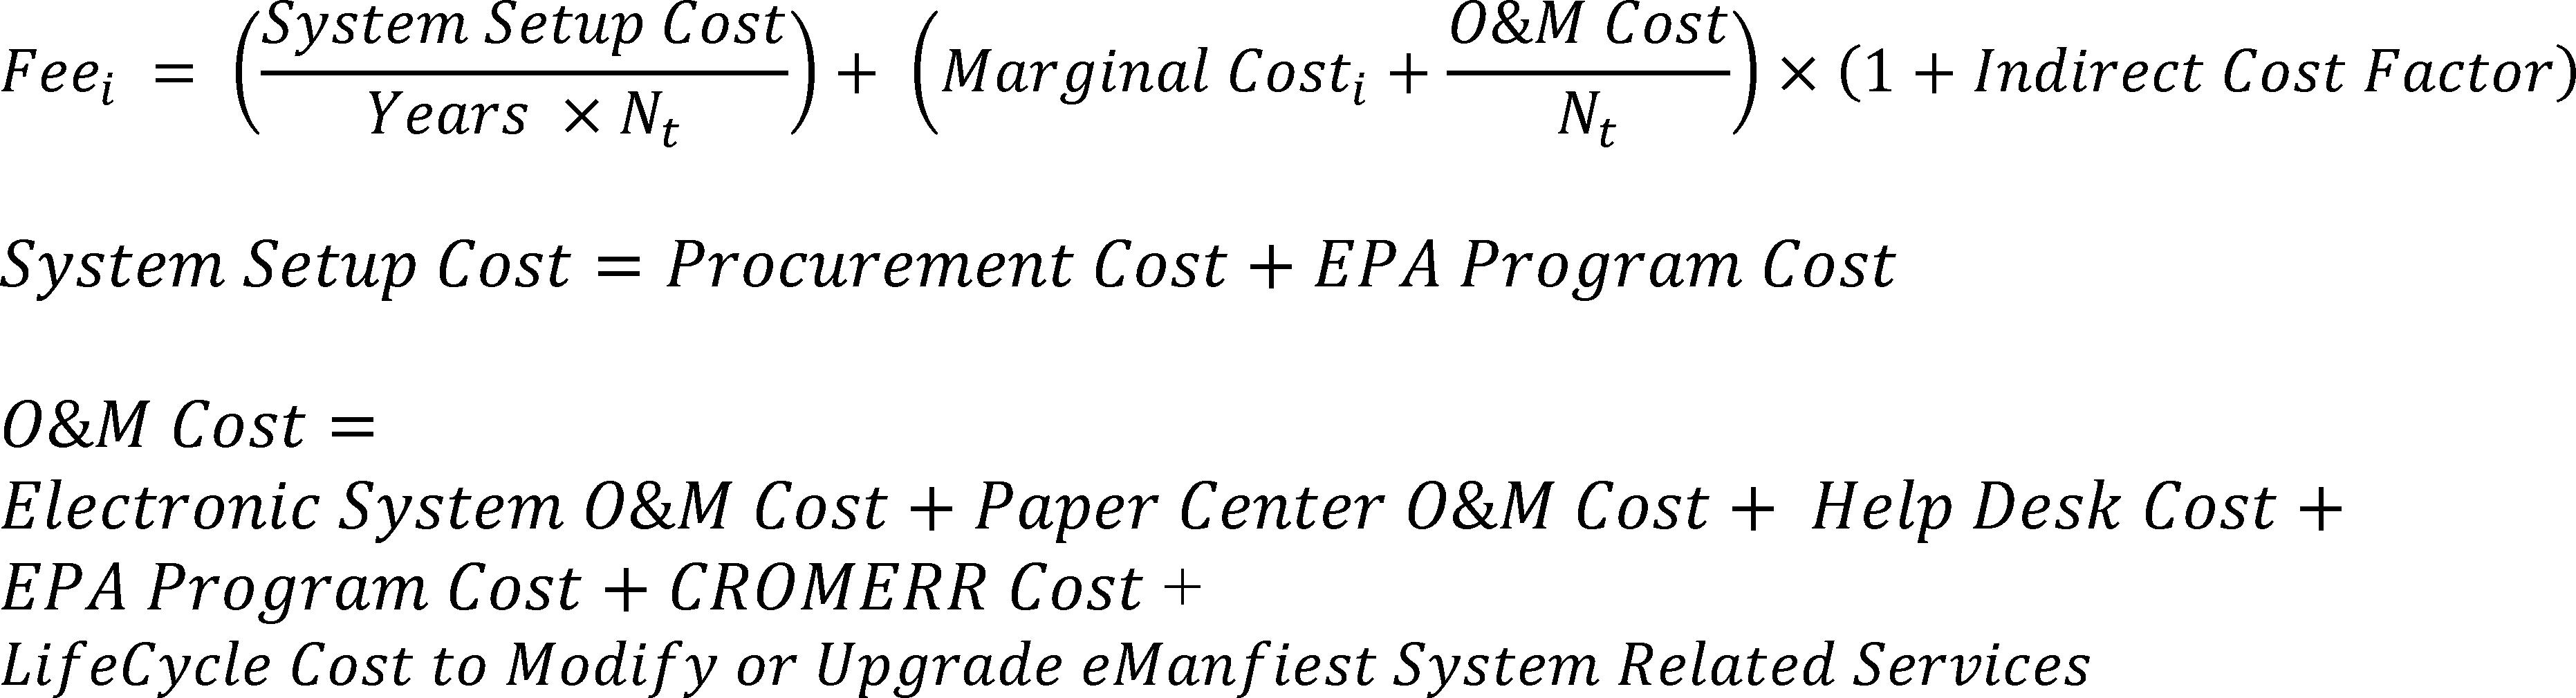 40 cfr 264.72